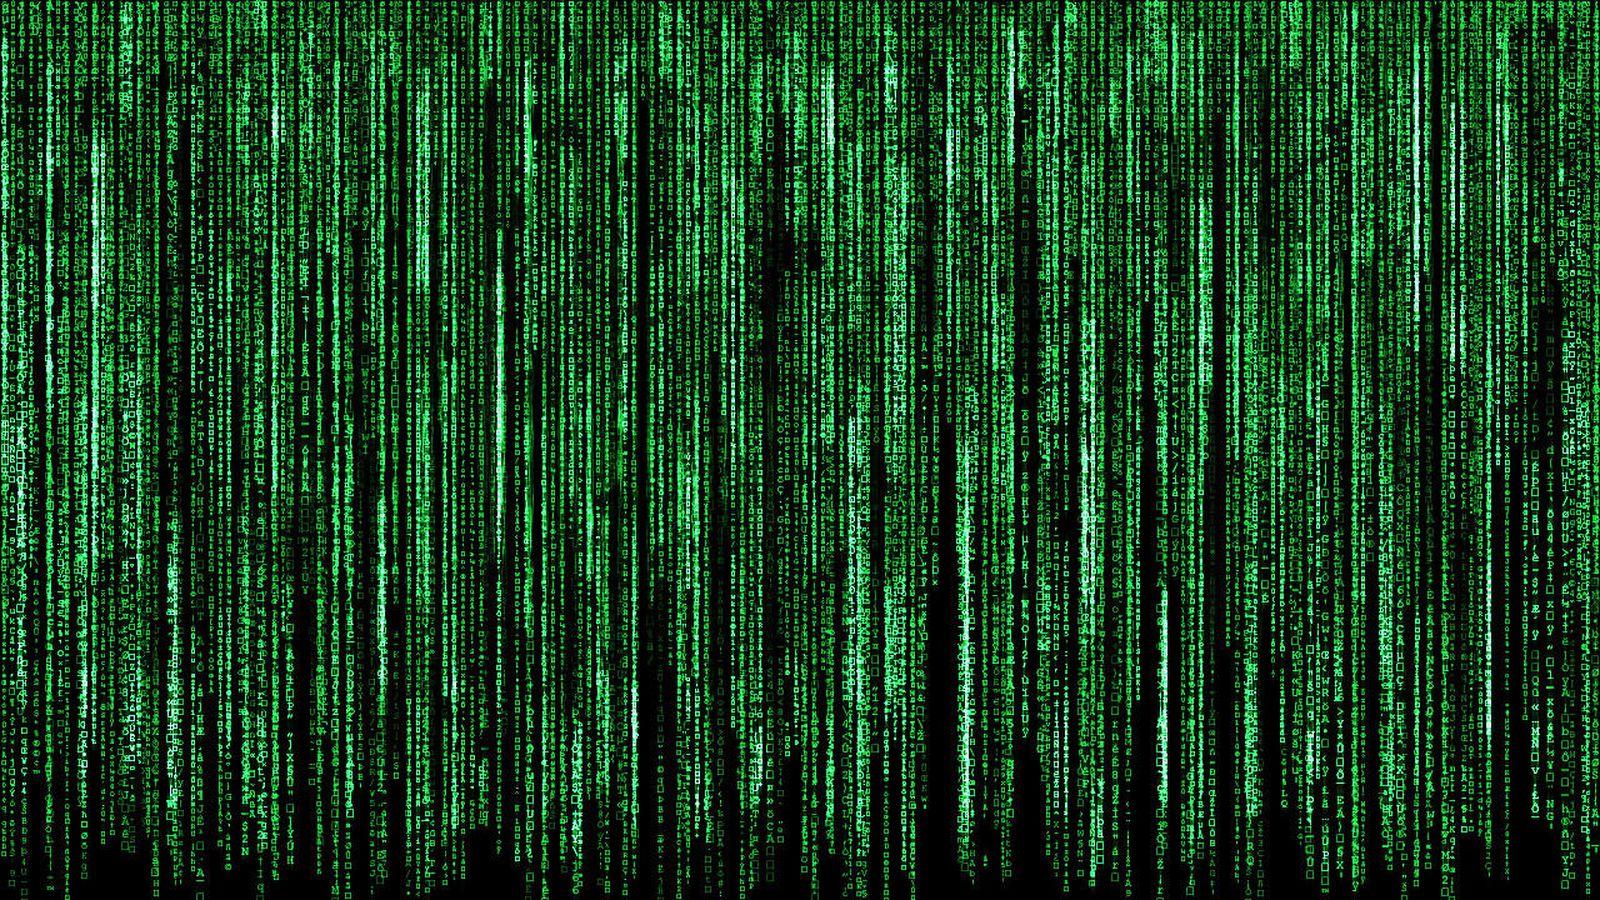 La recette secrète de Matrix